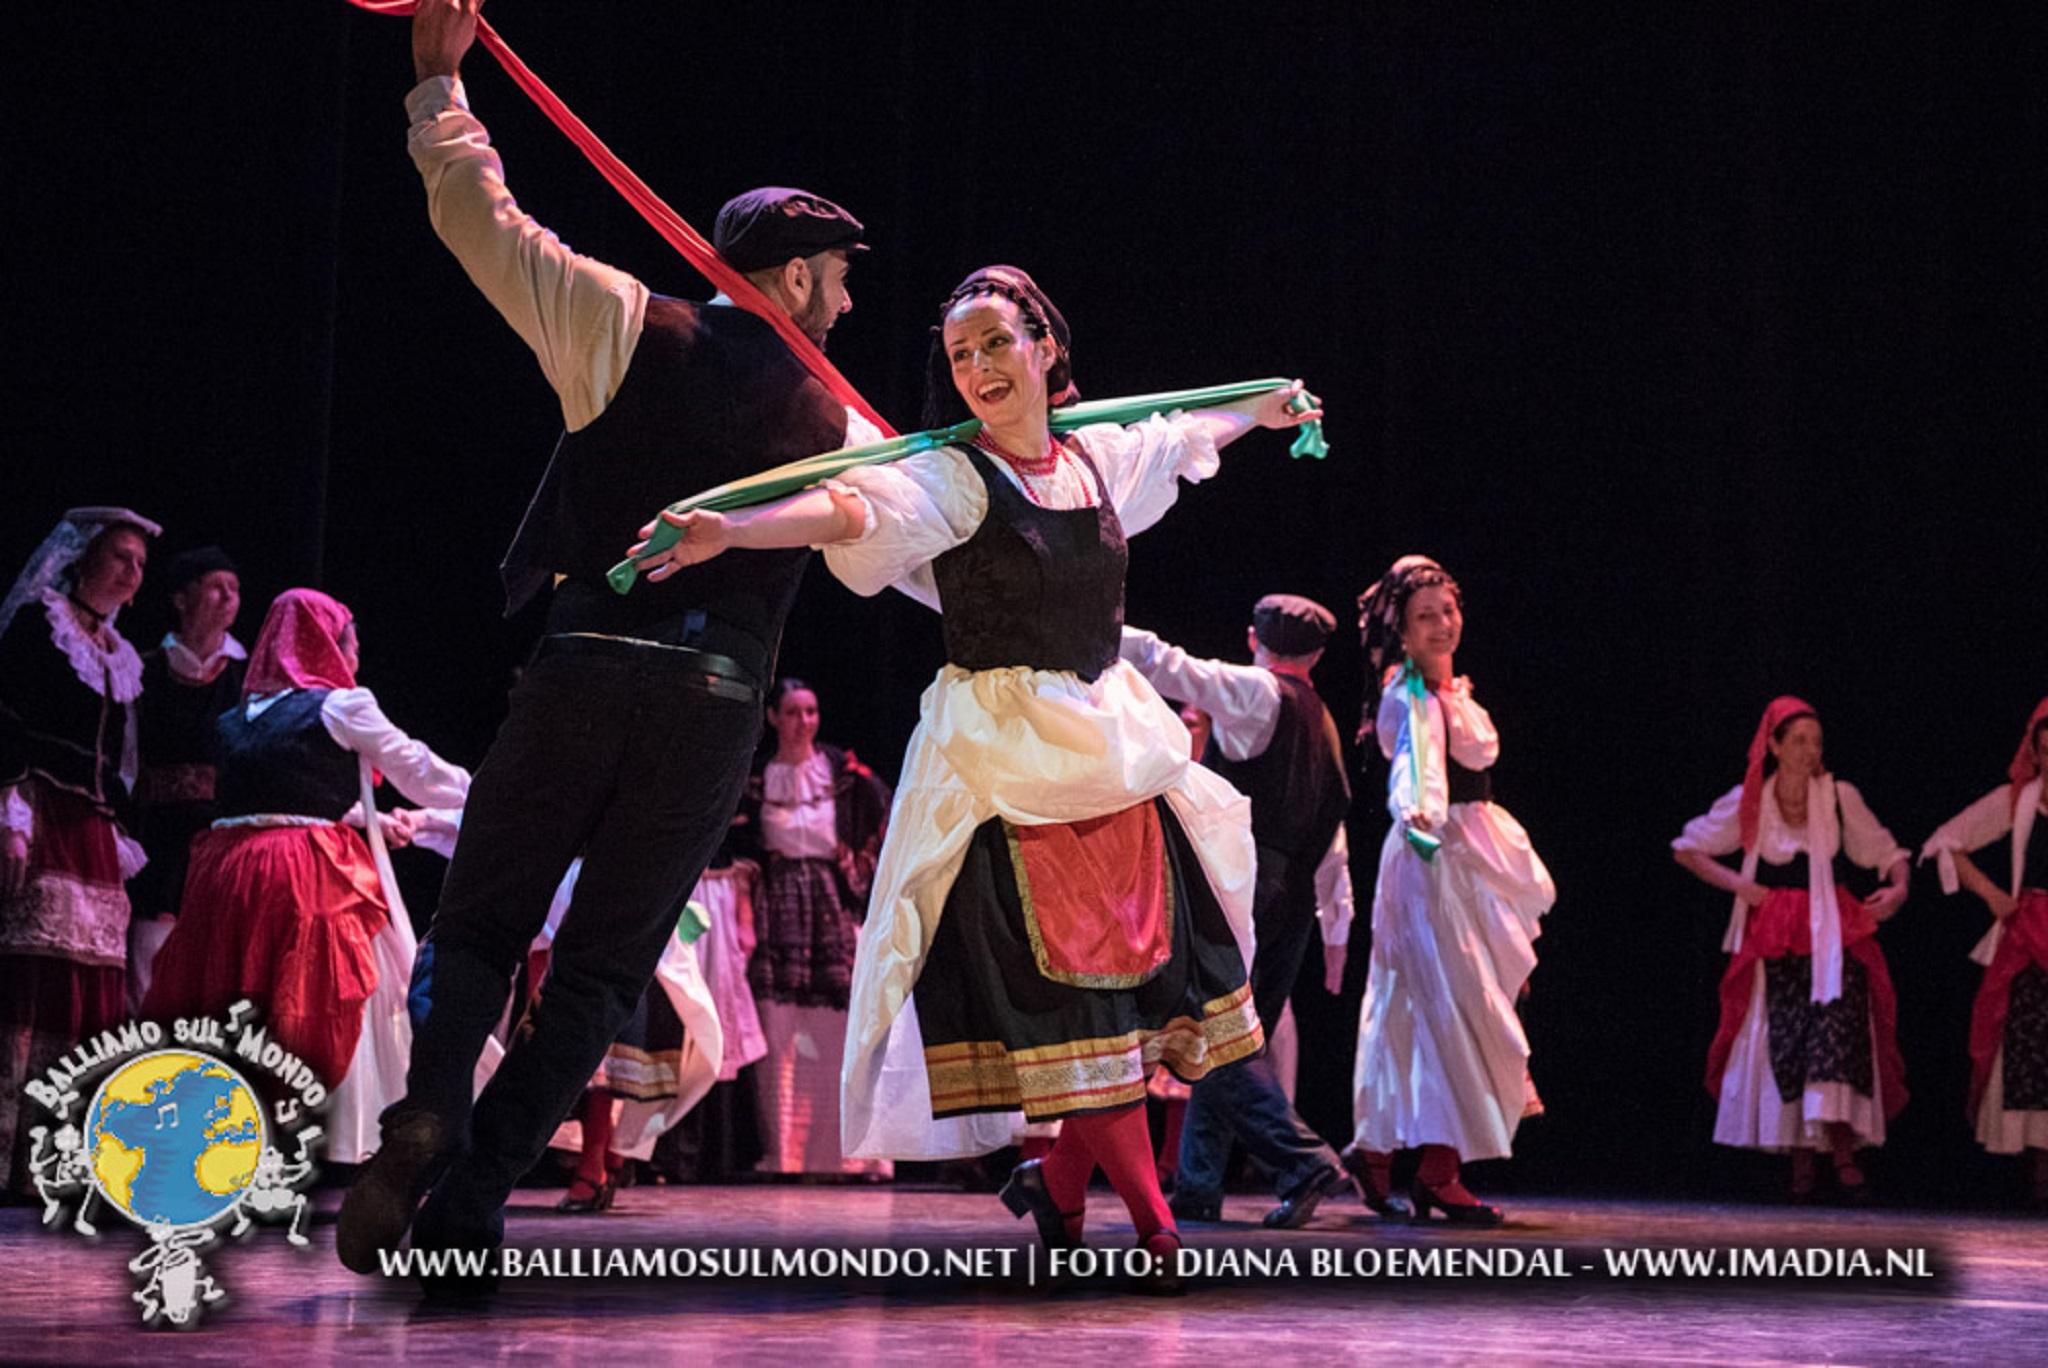 https://www.balliamosulmondo.net/corsi/danze-popolari-internazionali/